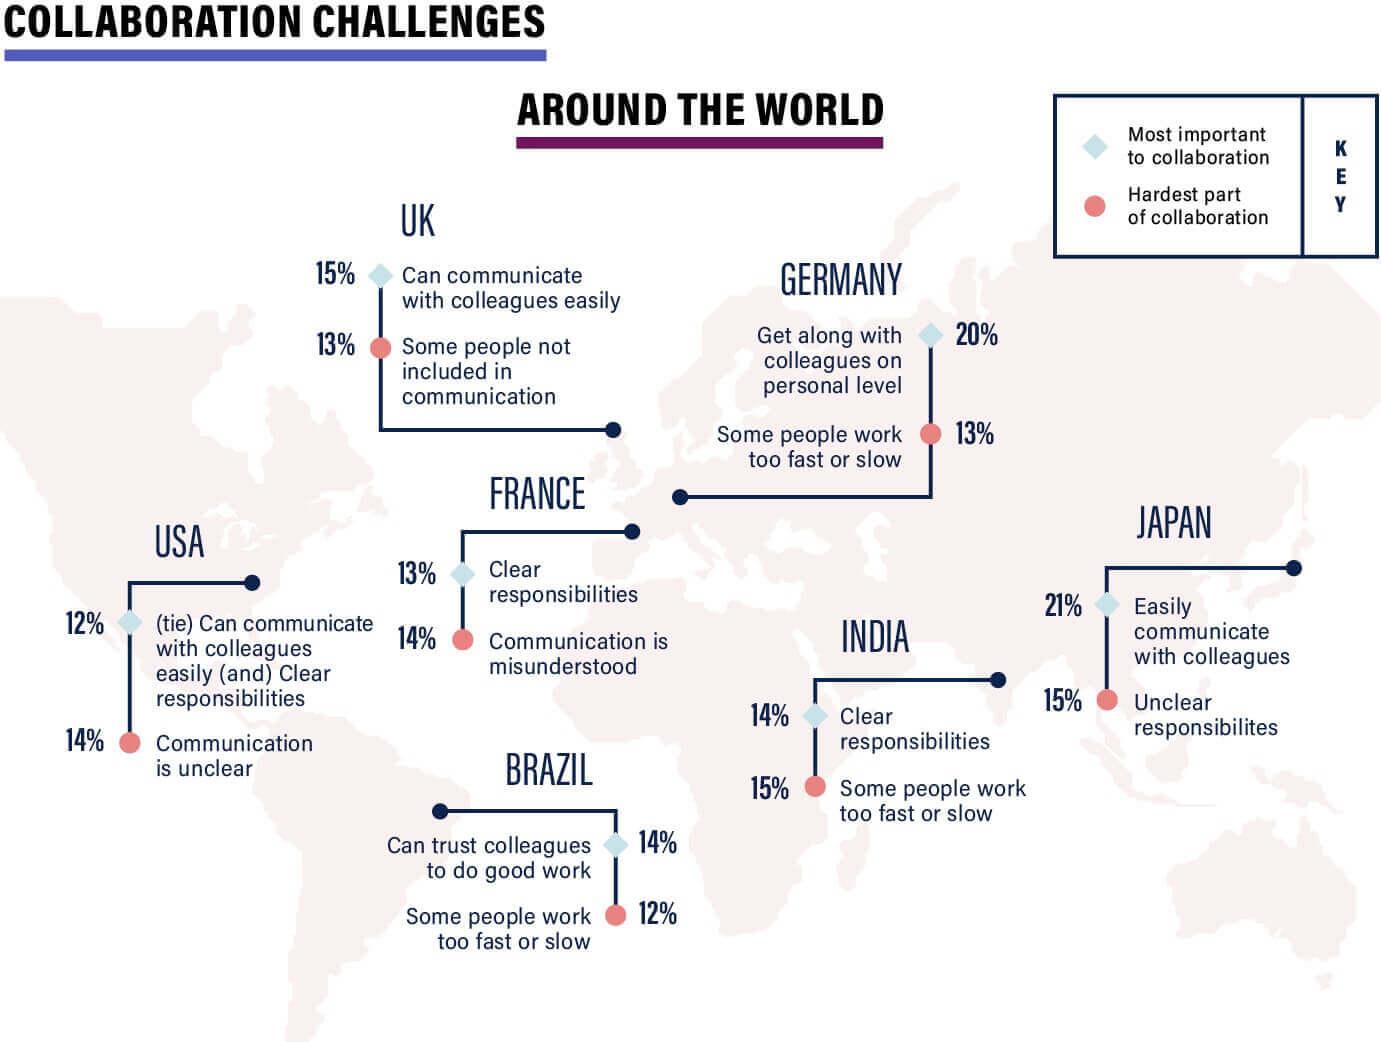 slack survey global collaboration challenges map